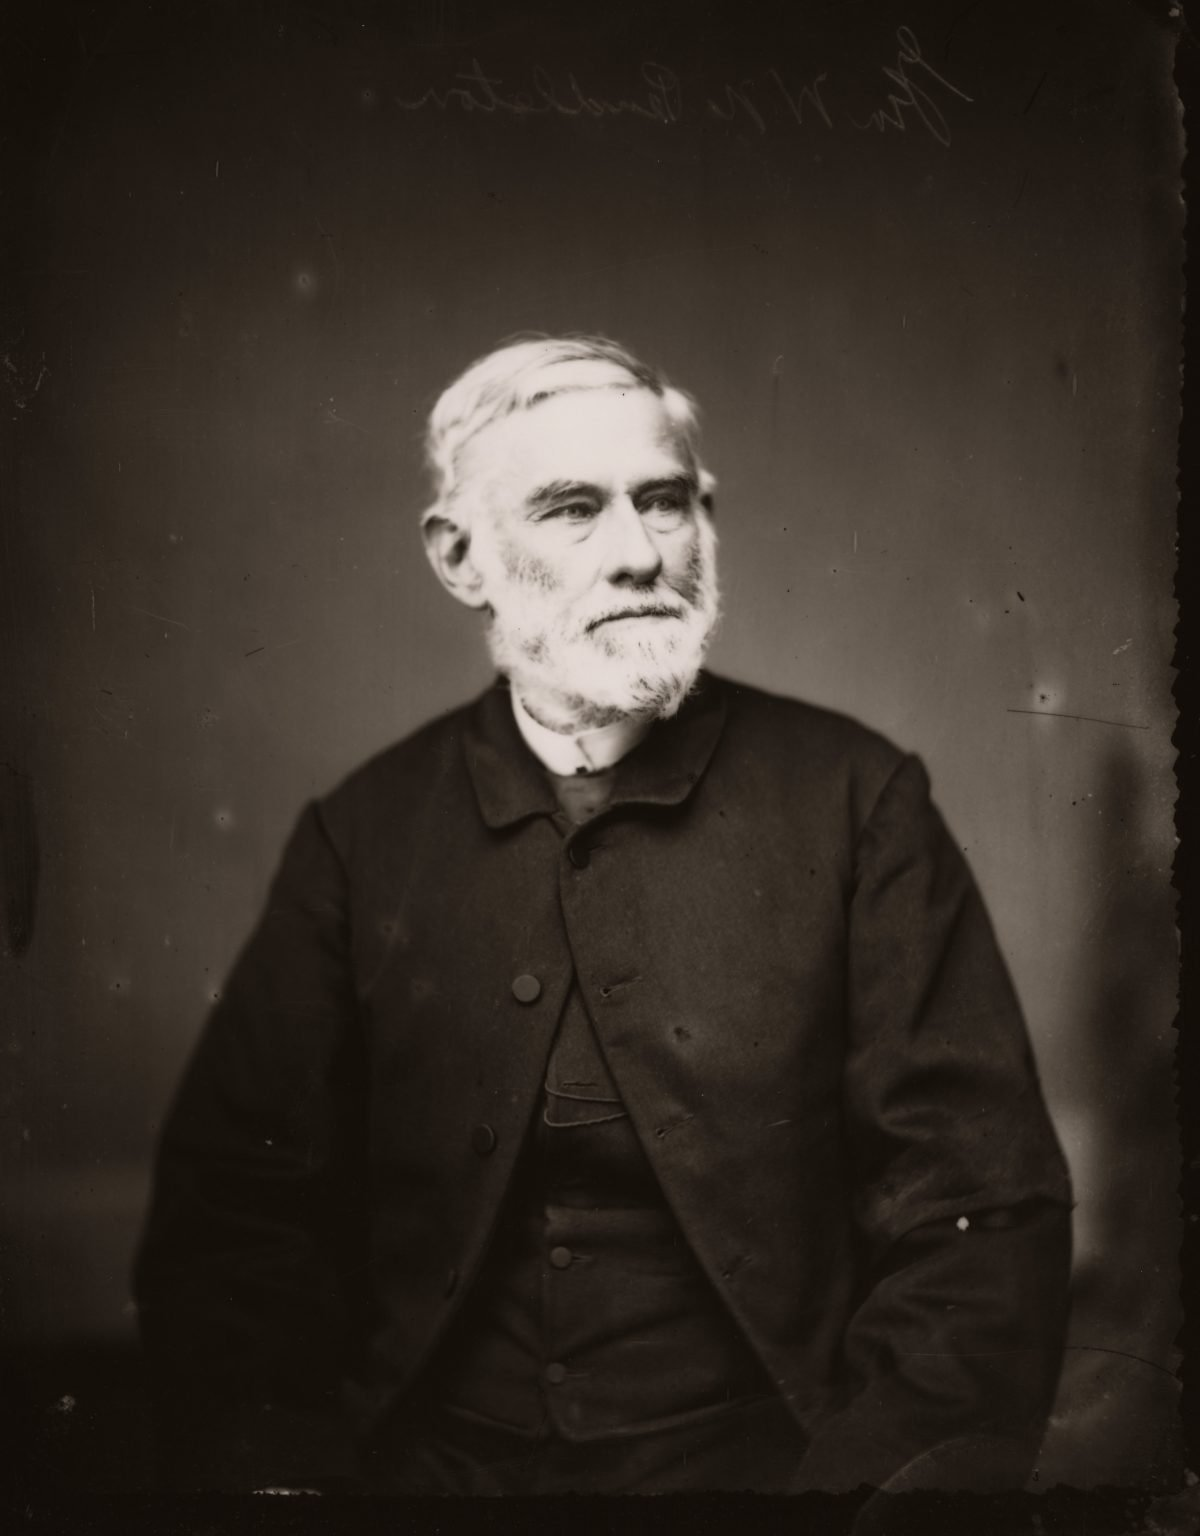 William Nelson Pendleton